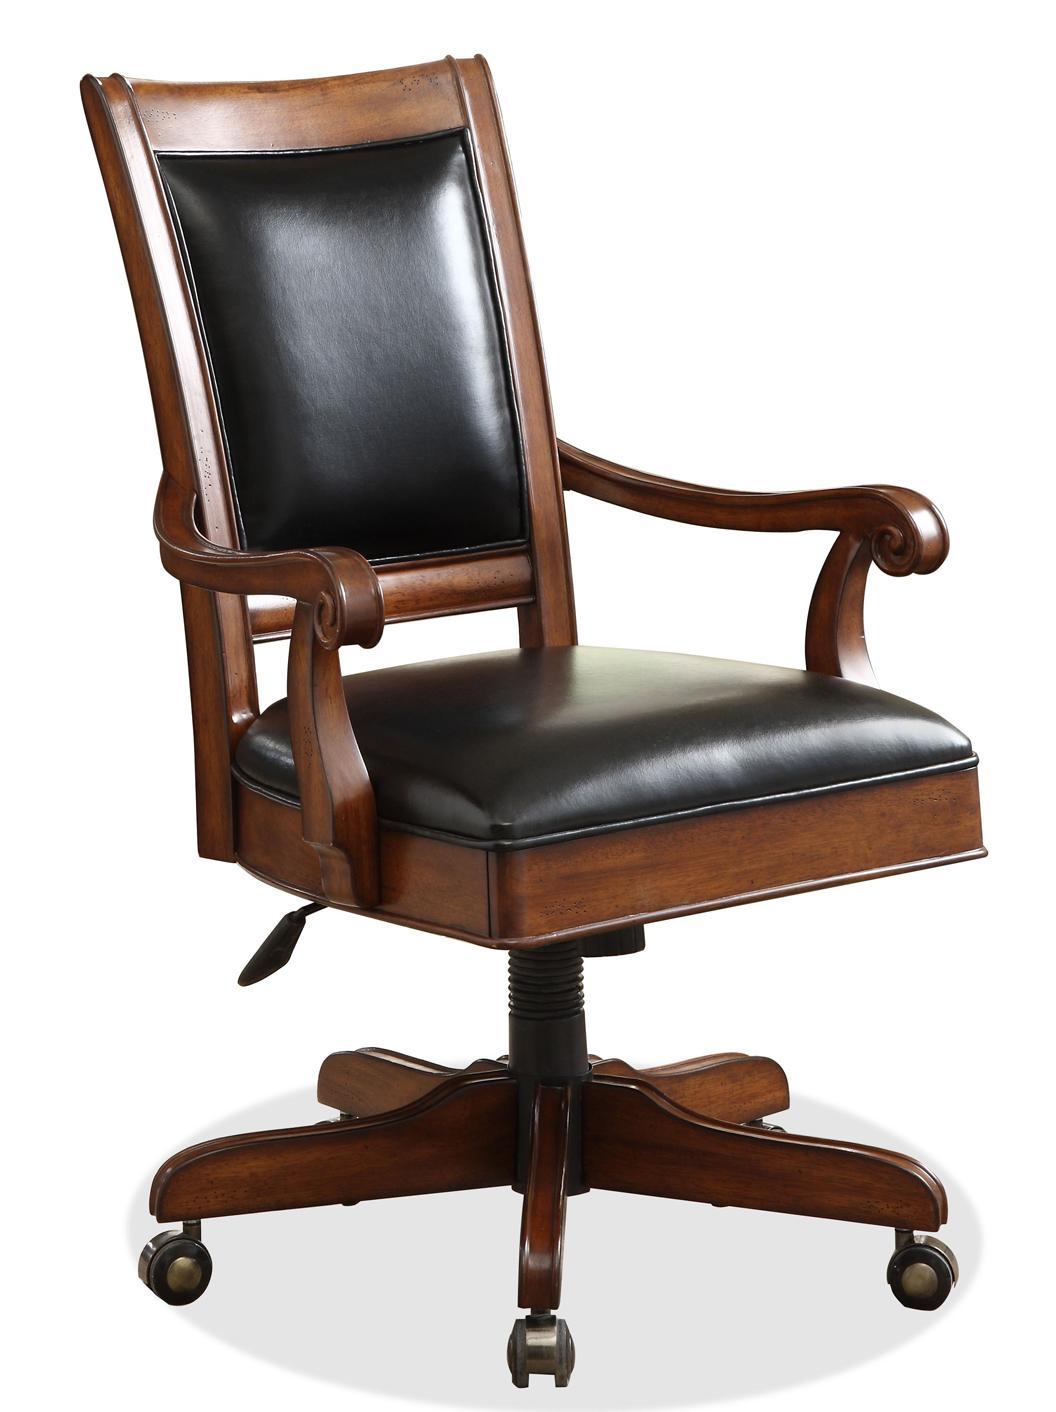 Riverside Furniture Bristol Court 24538 Caster Equipped